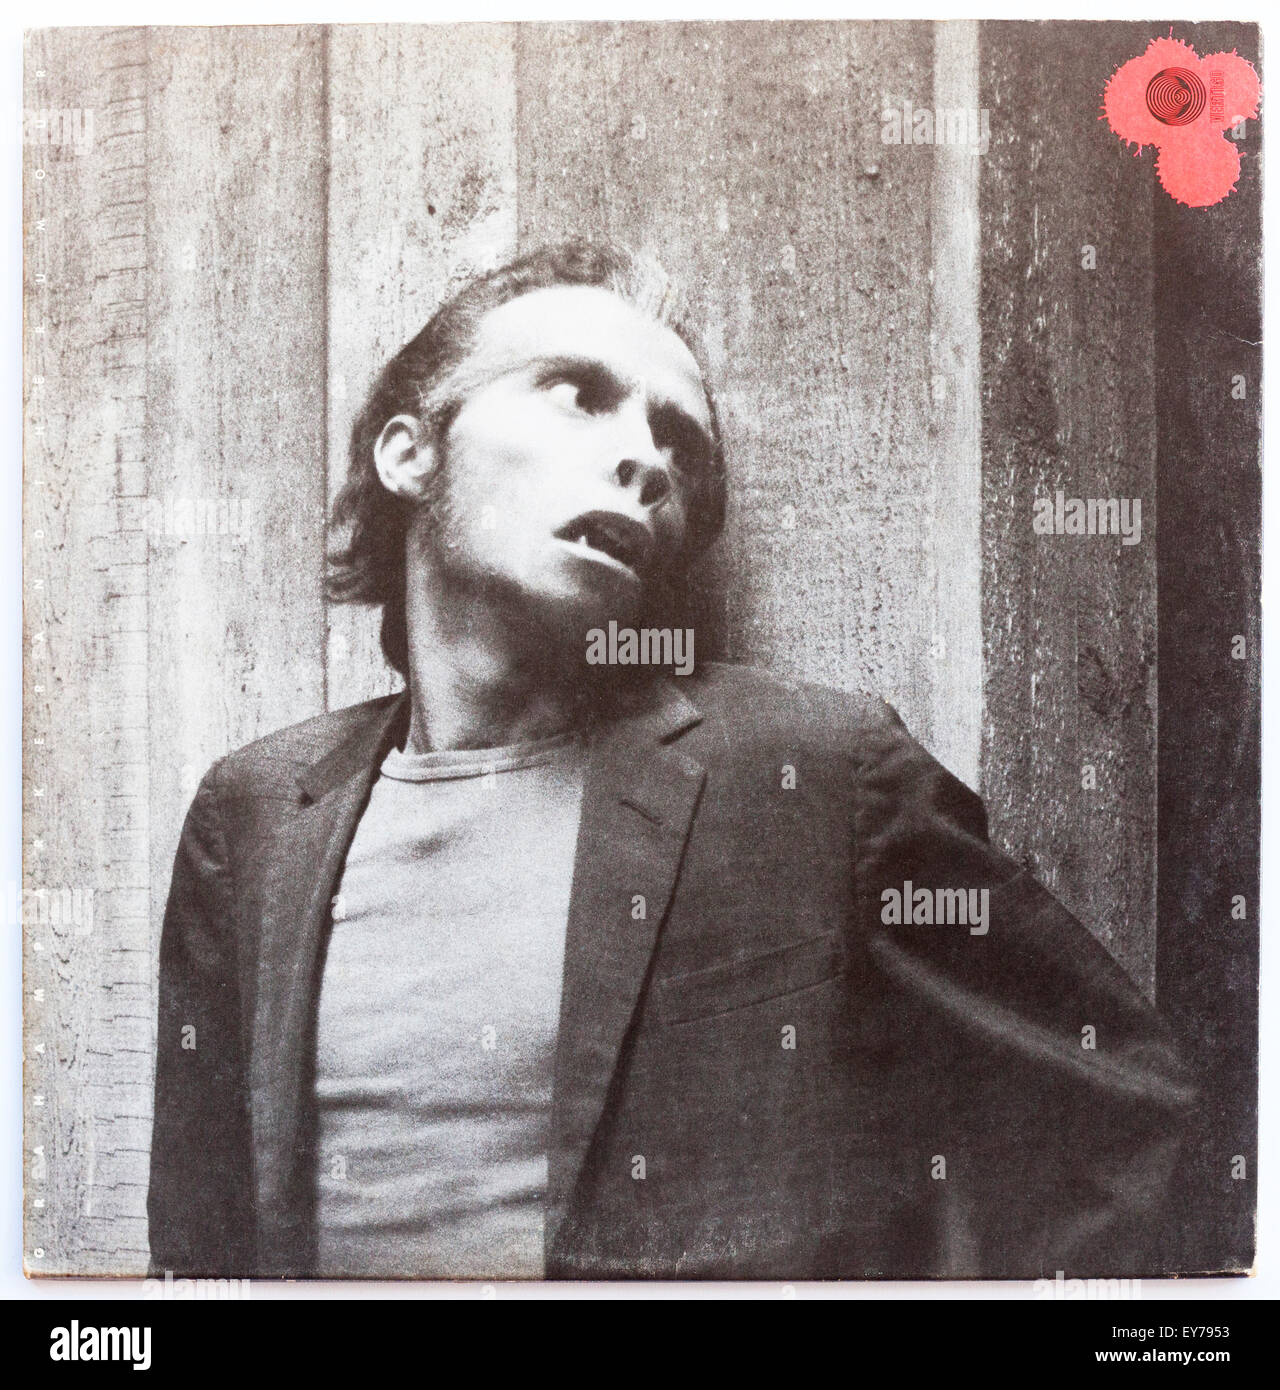 Cover of Graham Parker And the Rumour - Parkerilla, 1978 vinyl album on Vertigo - Stock Image